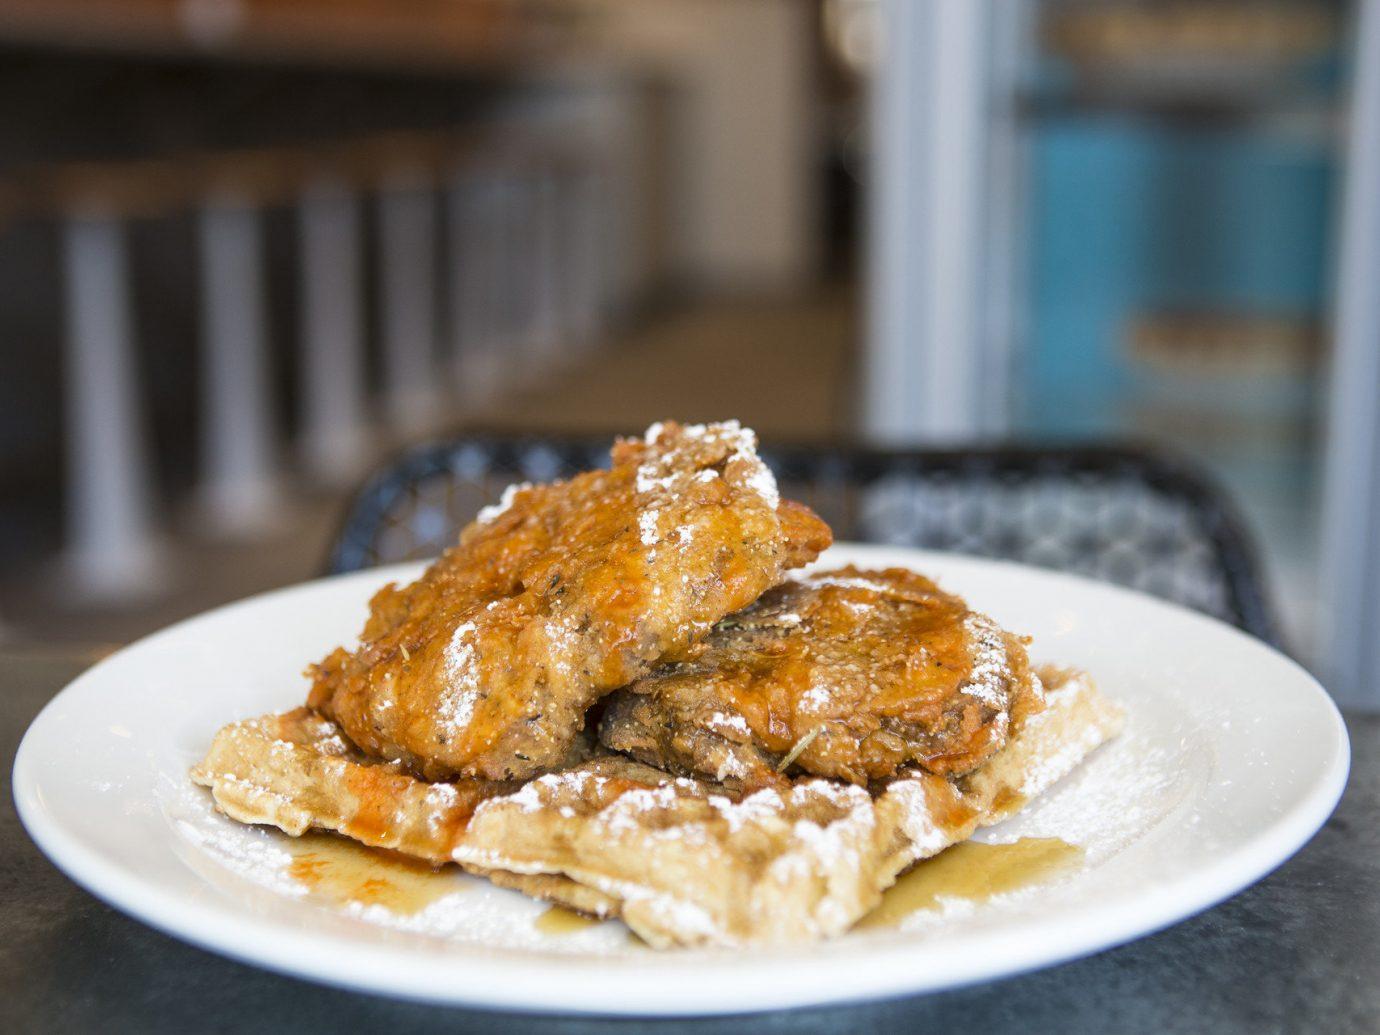 Food + Drink plate table food dish indoor meal breakfast produce fried food dessert cuisine meat eaten